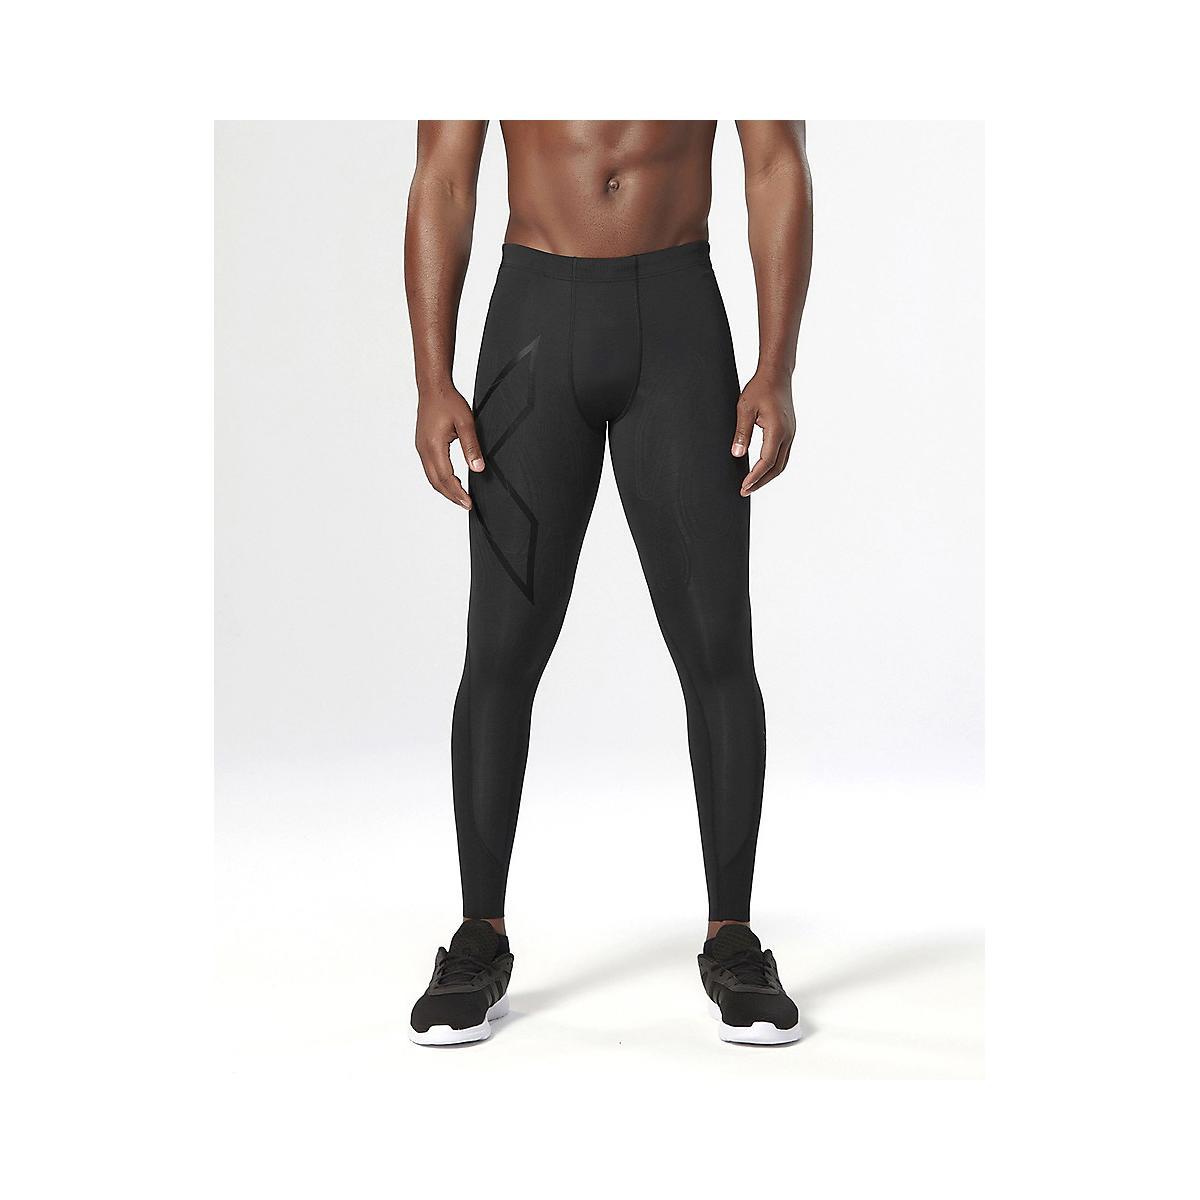 1a5a499c05 Mens 2XU Elite MCS Compression Tights & Leggings at Road Runner Sports